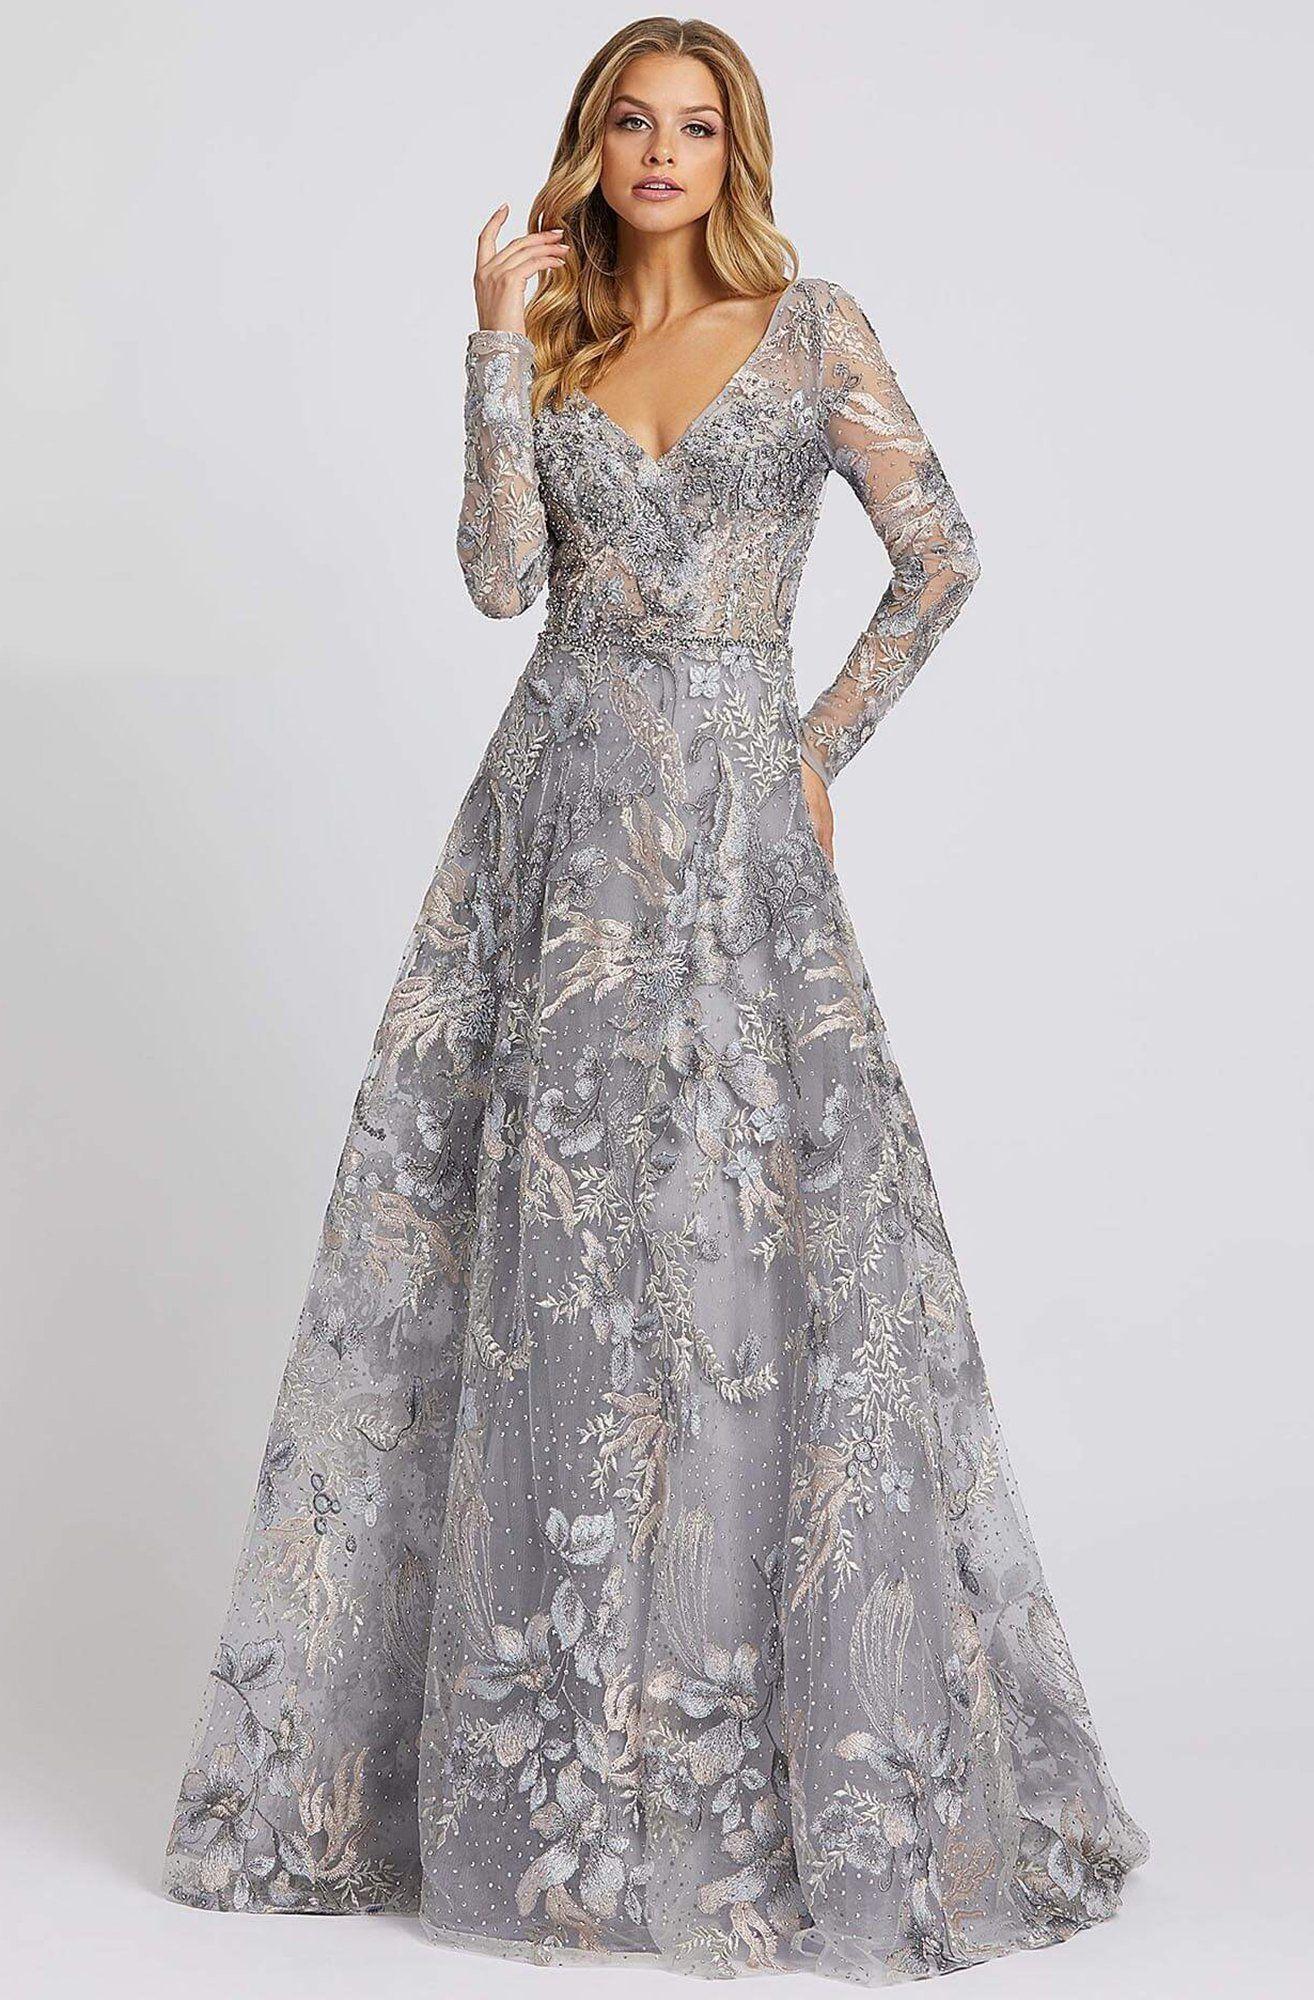 Mac Duggal Evening 20214d Illusion Long Sleeve Embroidered Gown In 2021 Long Sleeve Embroidered Dress Long Sleeve Dress Formal Embroidered Dress [ 2000 x 1314 Pixel ]